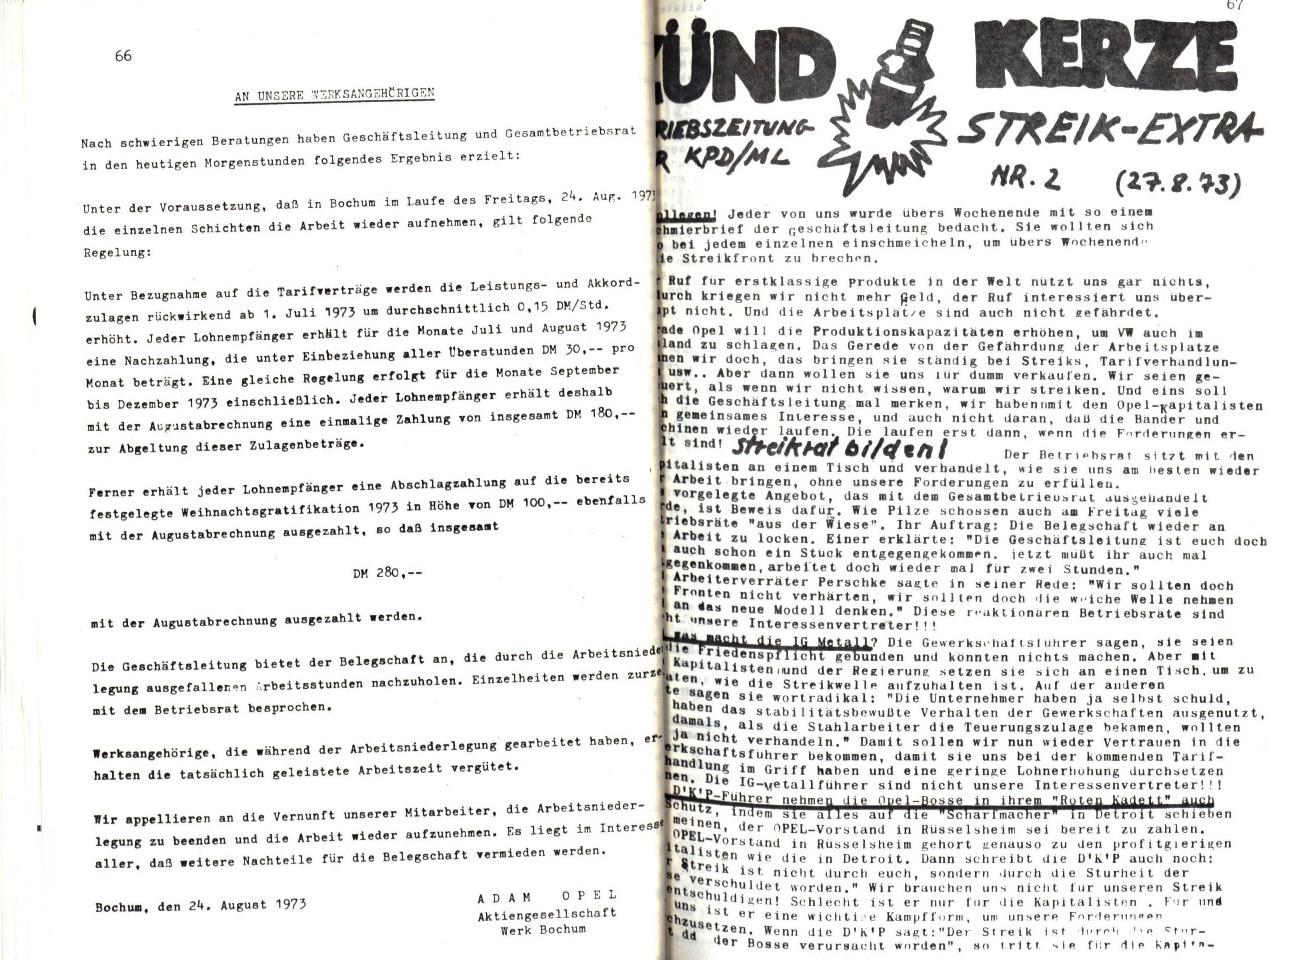 Bochum_IGM_Opel_PG_Opel_streikt_1973_035